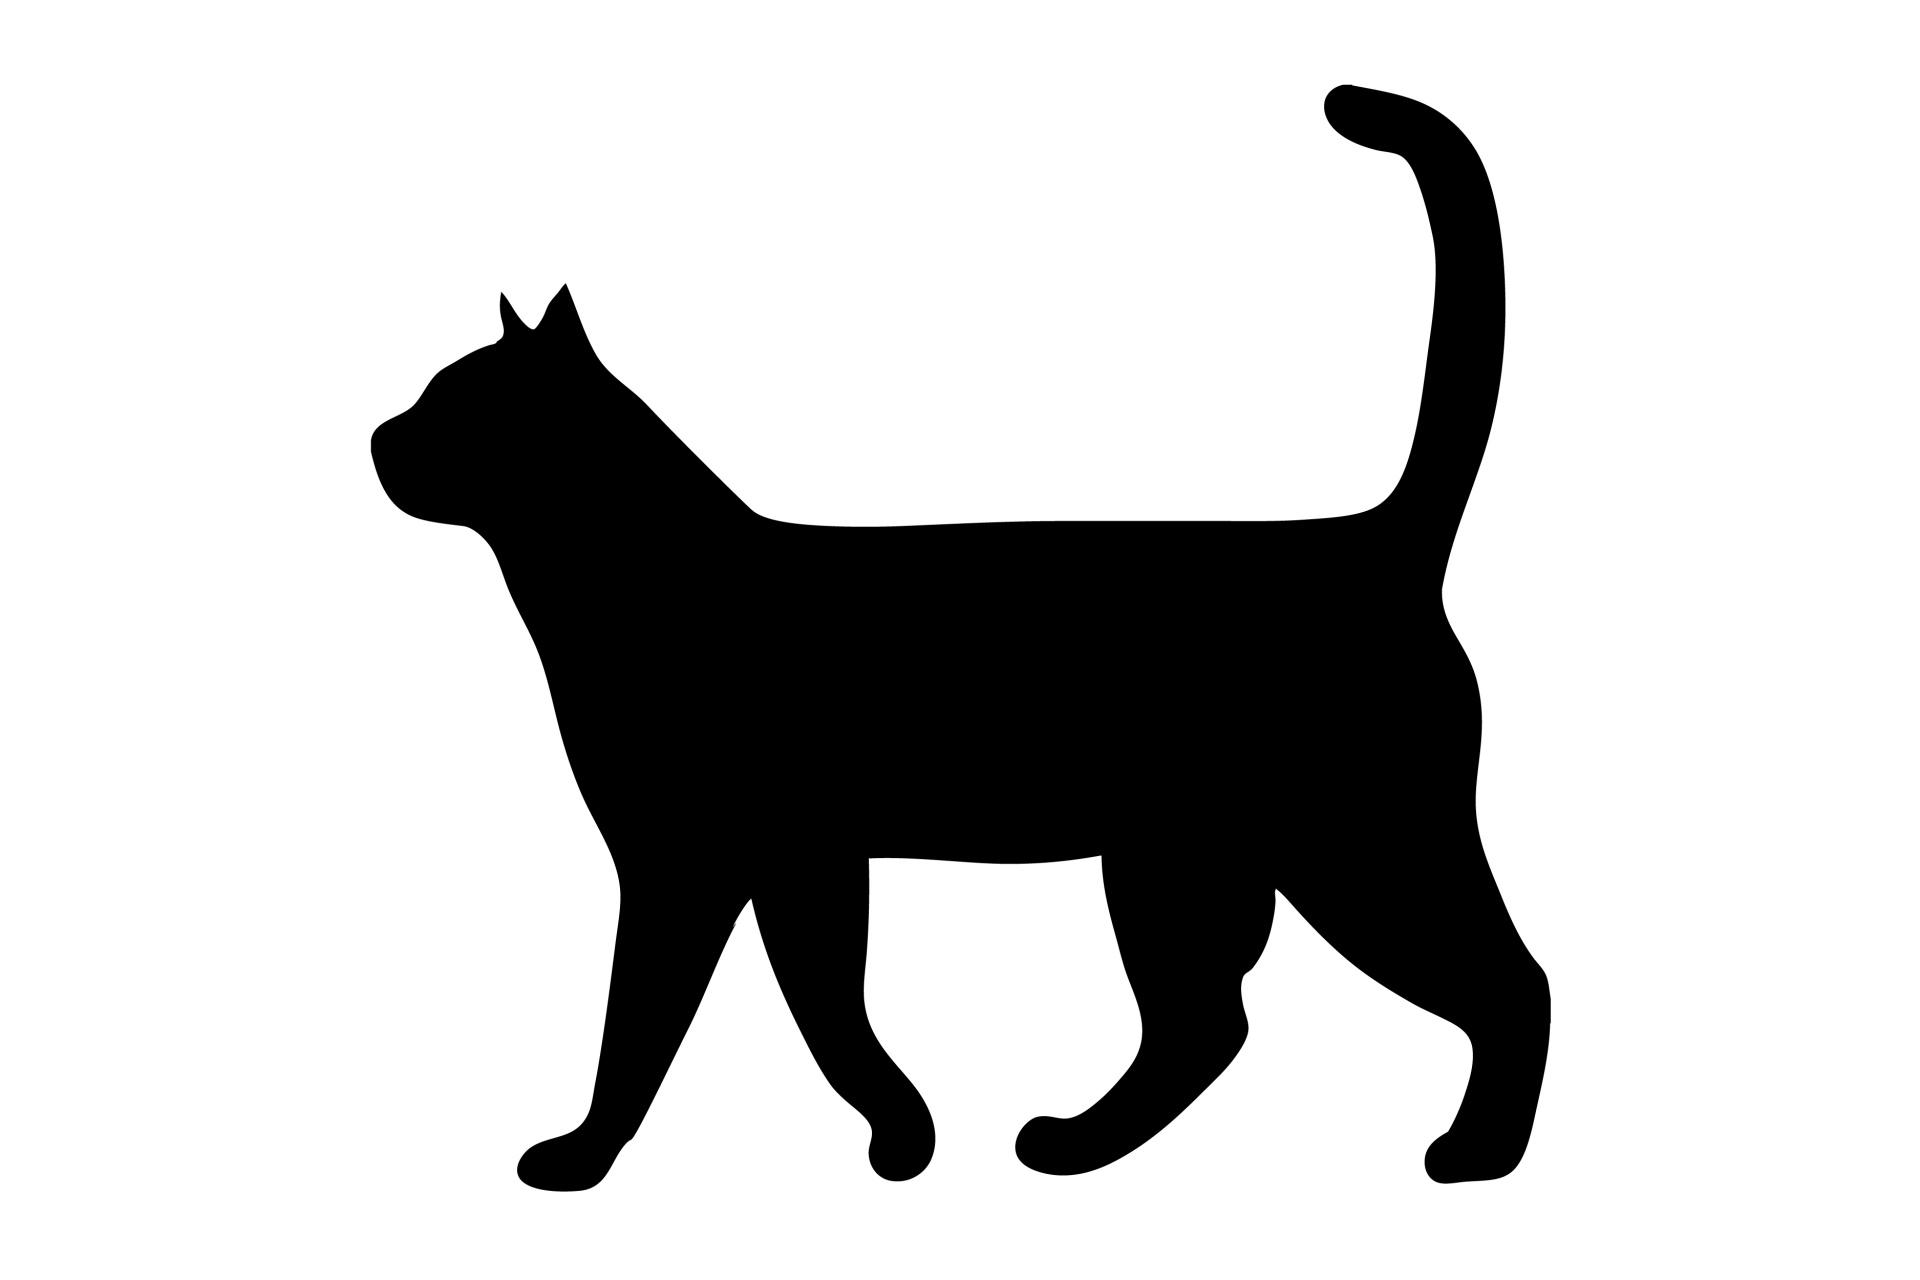 1920x1280 Clip Art Cat Walk Clipart Walking Pencil And In Color Lemonize